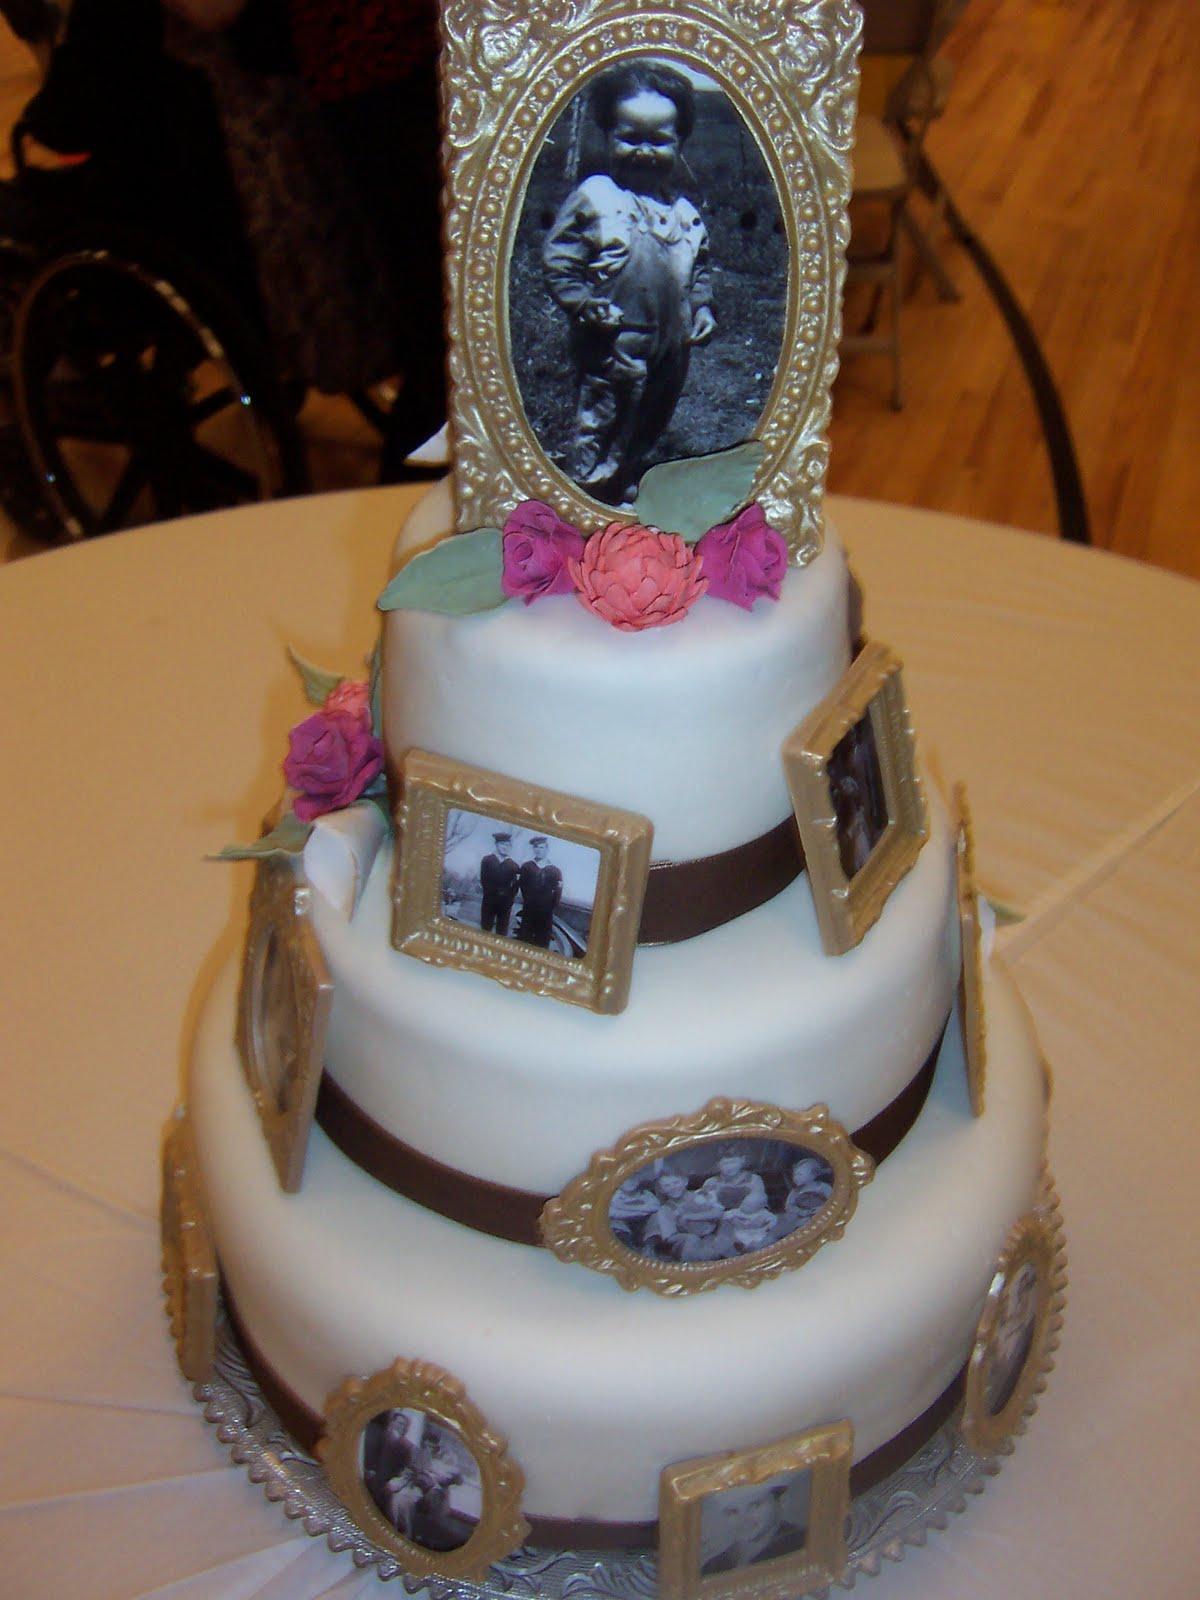 Ambers Birthday Creations: Grandpas 90th Birthday Cake/Party